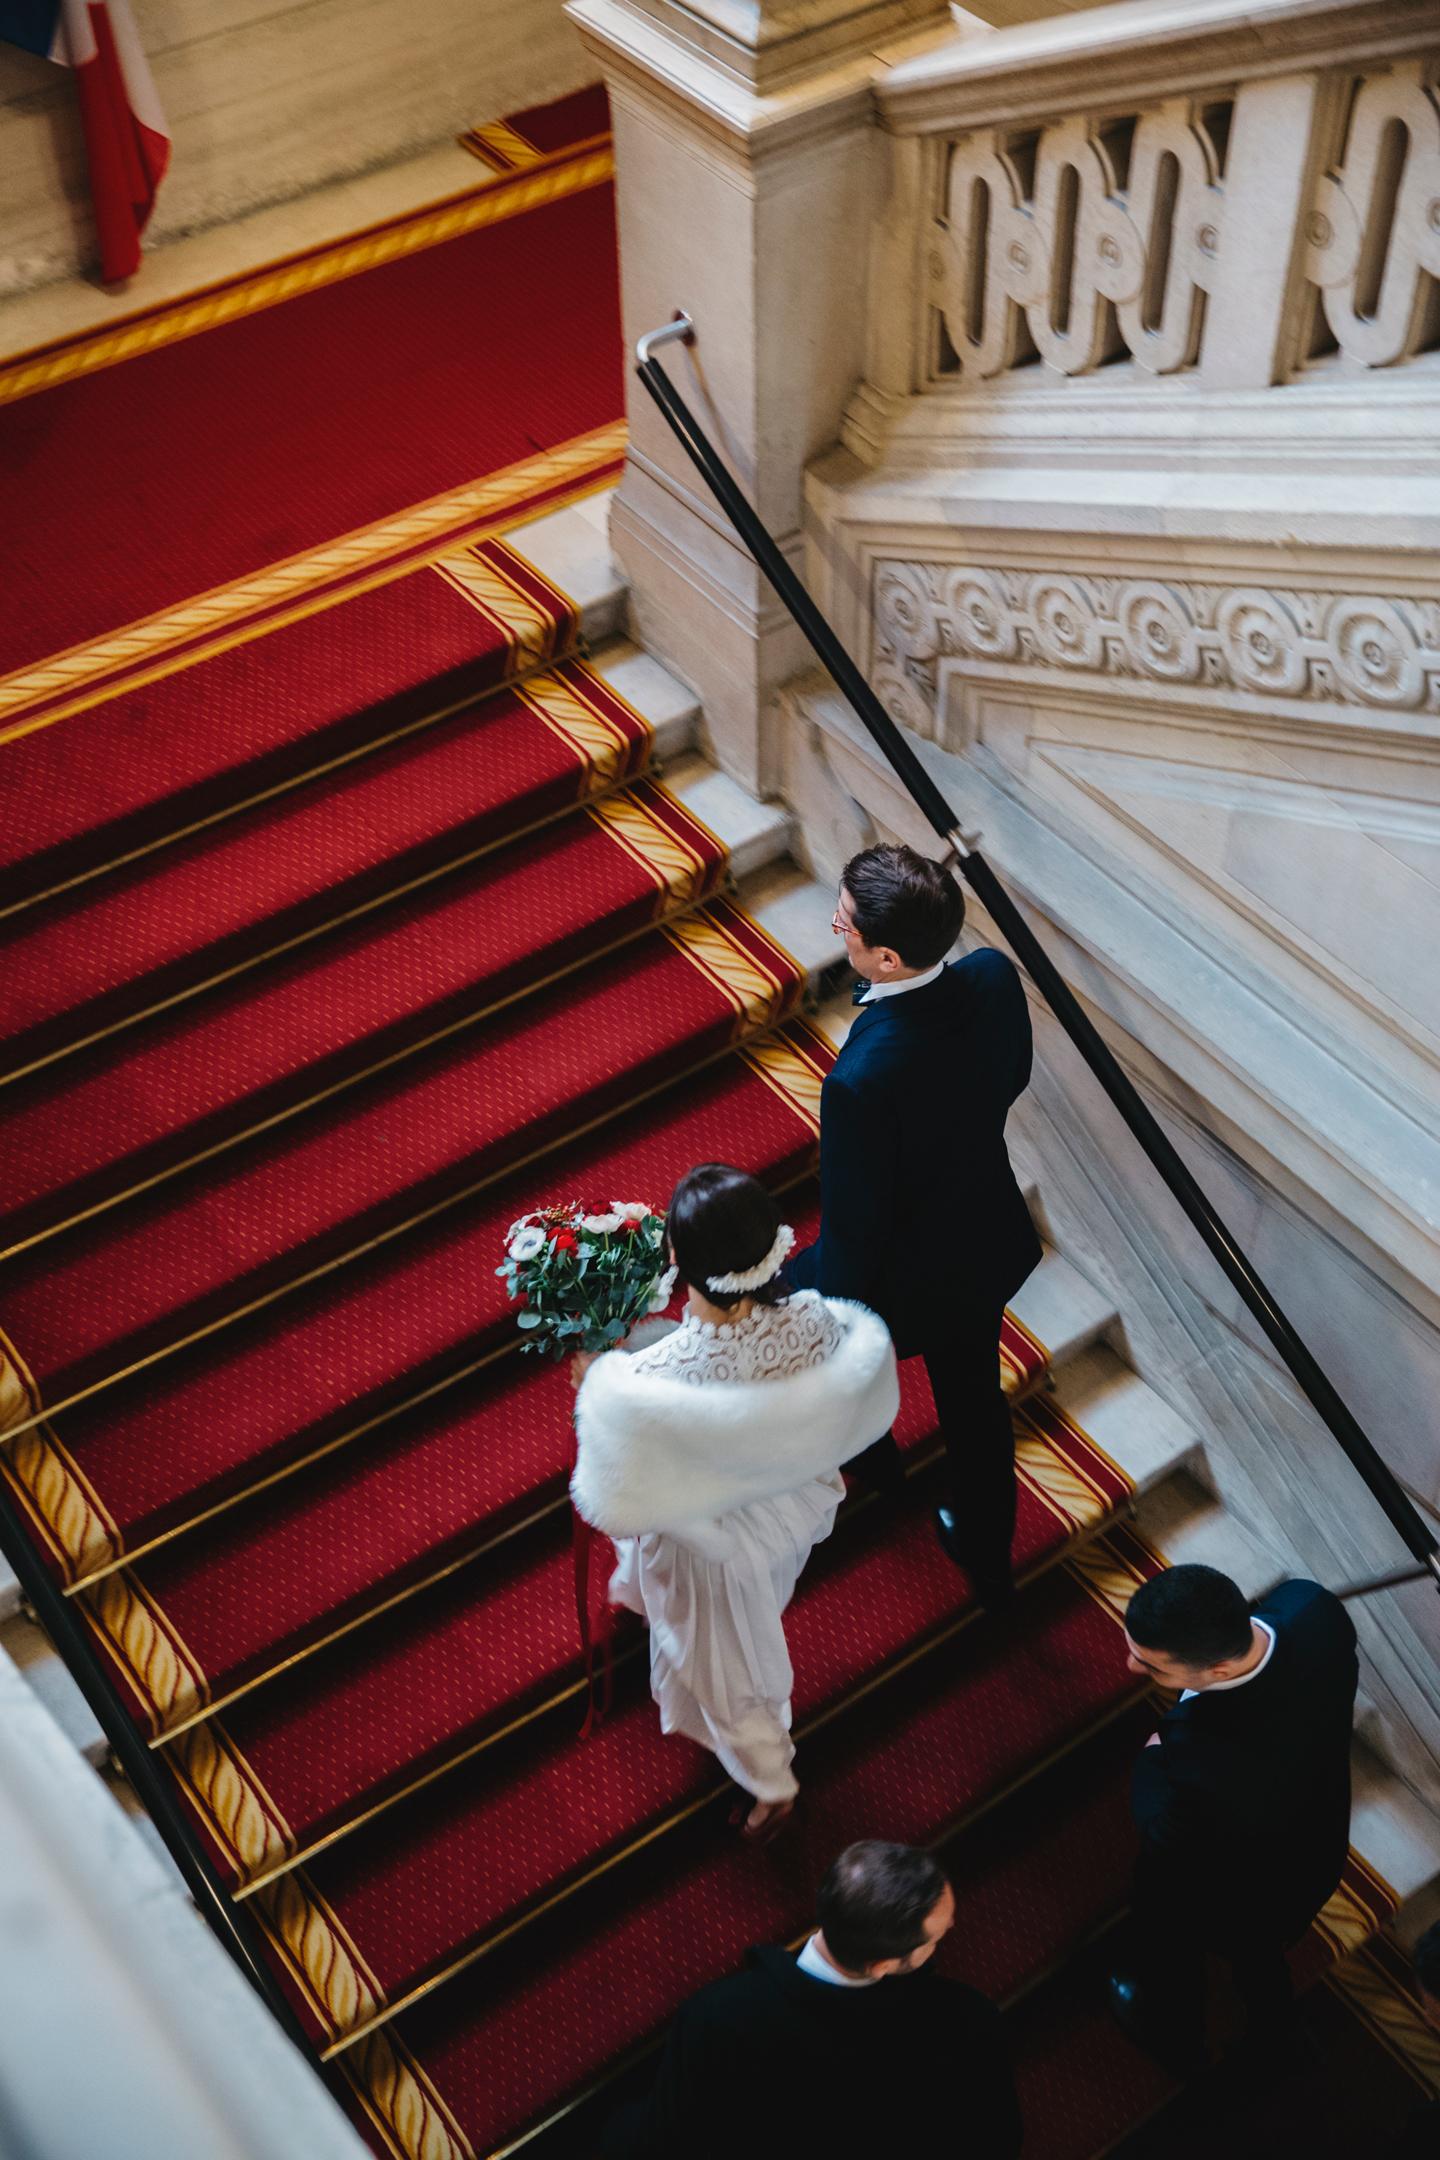 mariage-daphne-moreau-mode-and-the-city-civil-celine-marks6